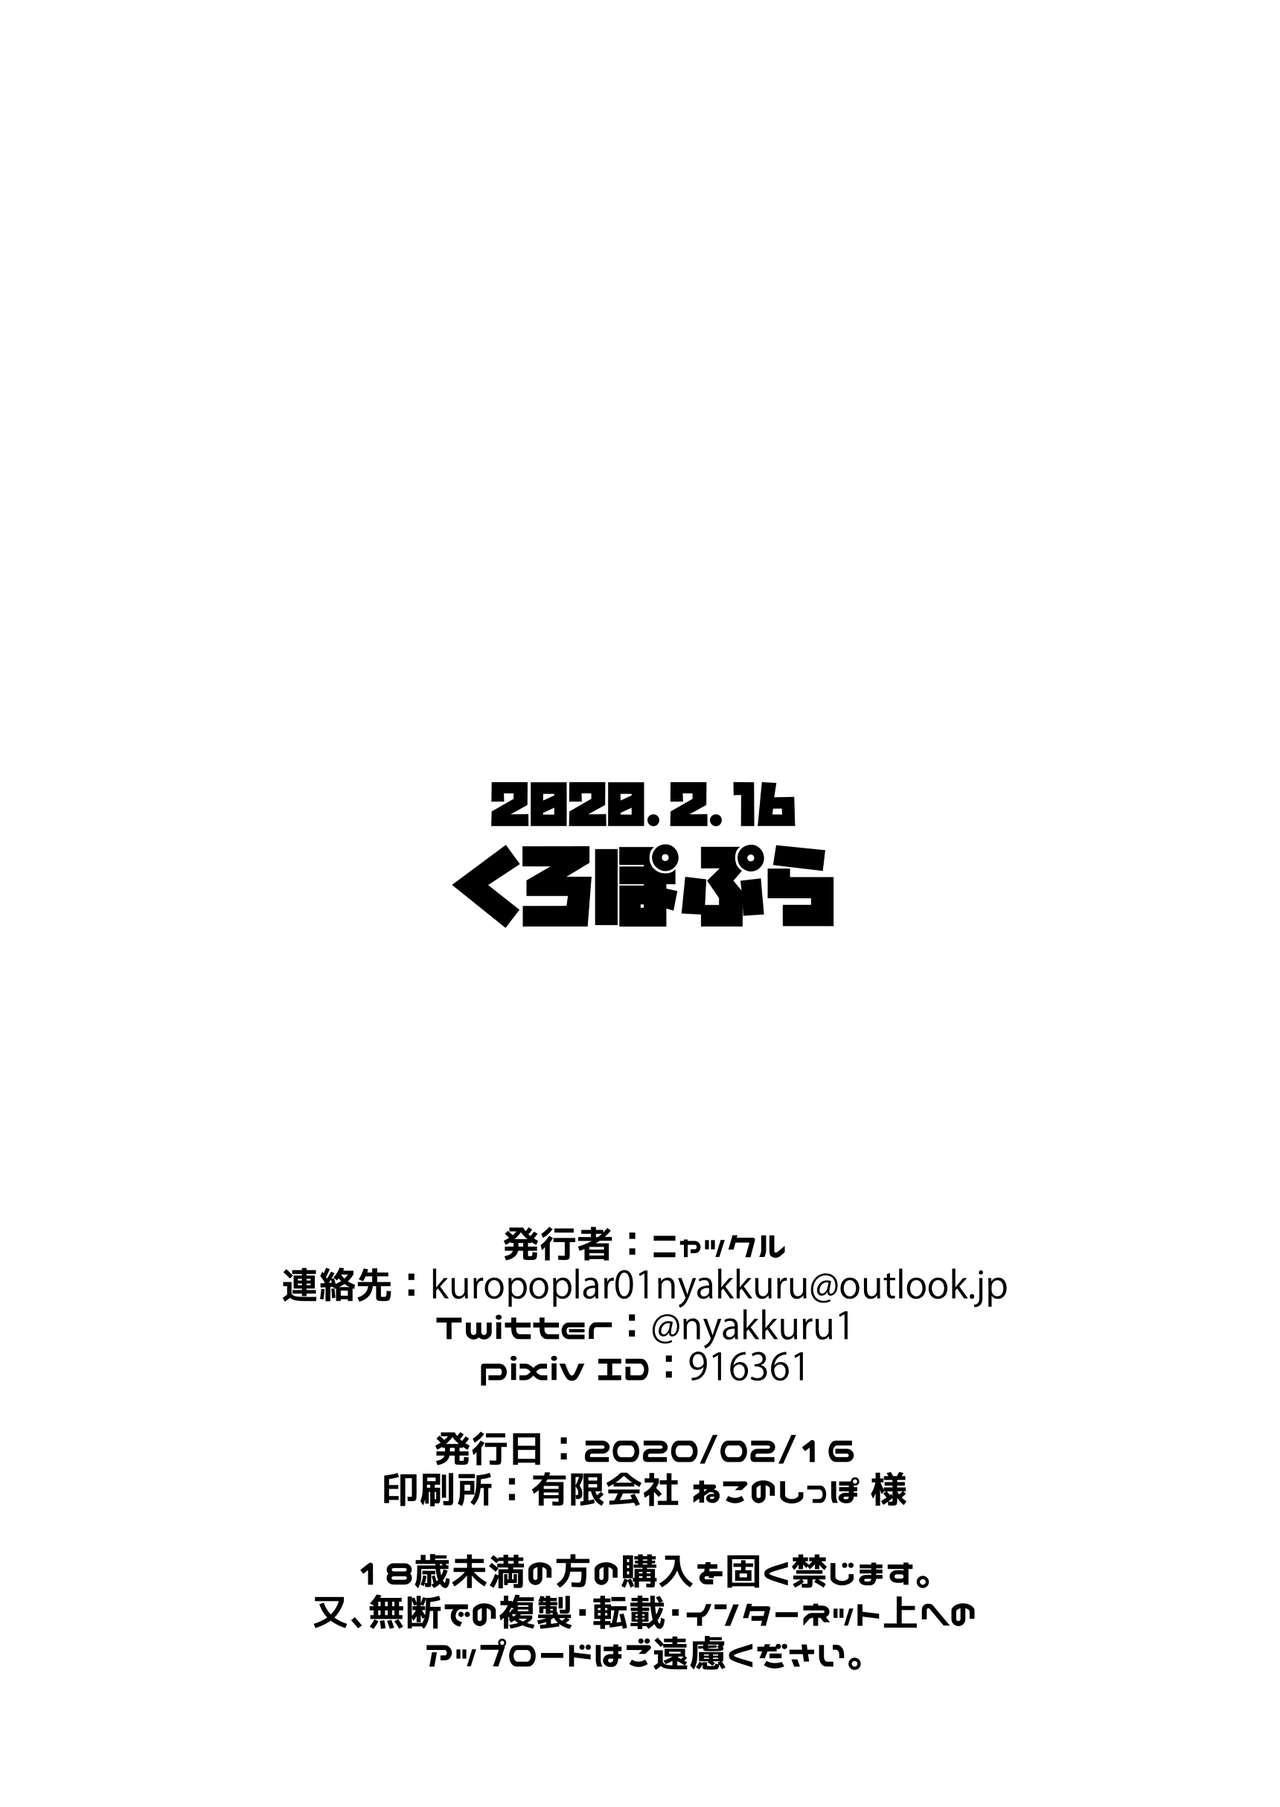 [Kuropoplar (Nyakkuru)] Onsen de 3-gou-kun ga Onee-san-tachi to Seiteki ni Hakadorimakuru Hon | A Book About #3-kun Advancing in Sexual Things with the Onee-sans in the Onsen (Hacka Doll) [English] [Tabunne Scans] [Digital] 10